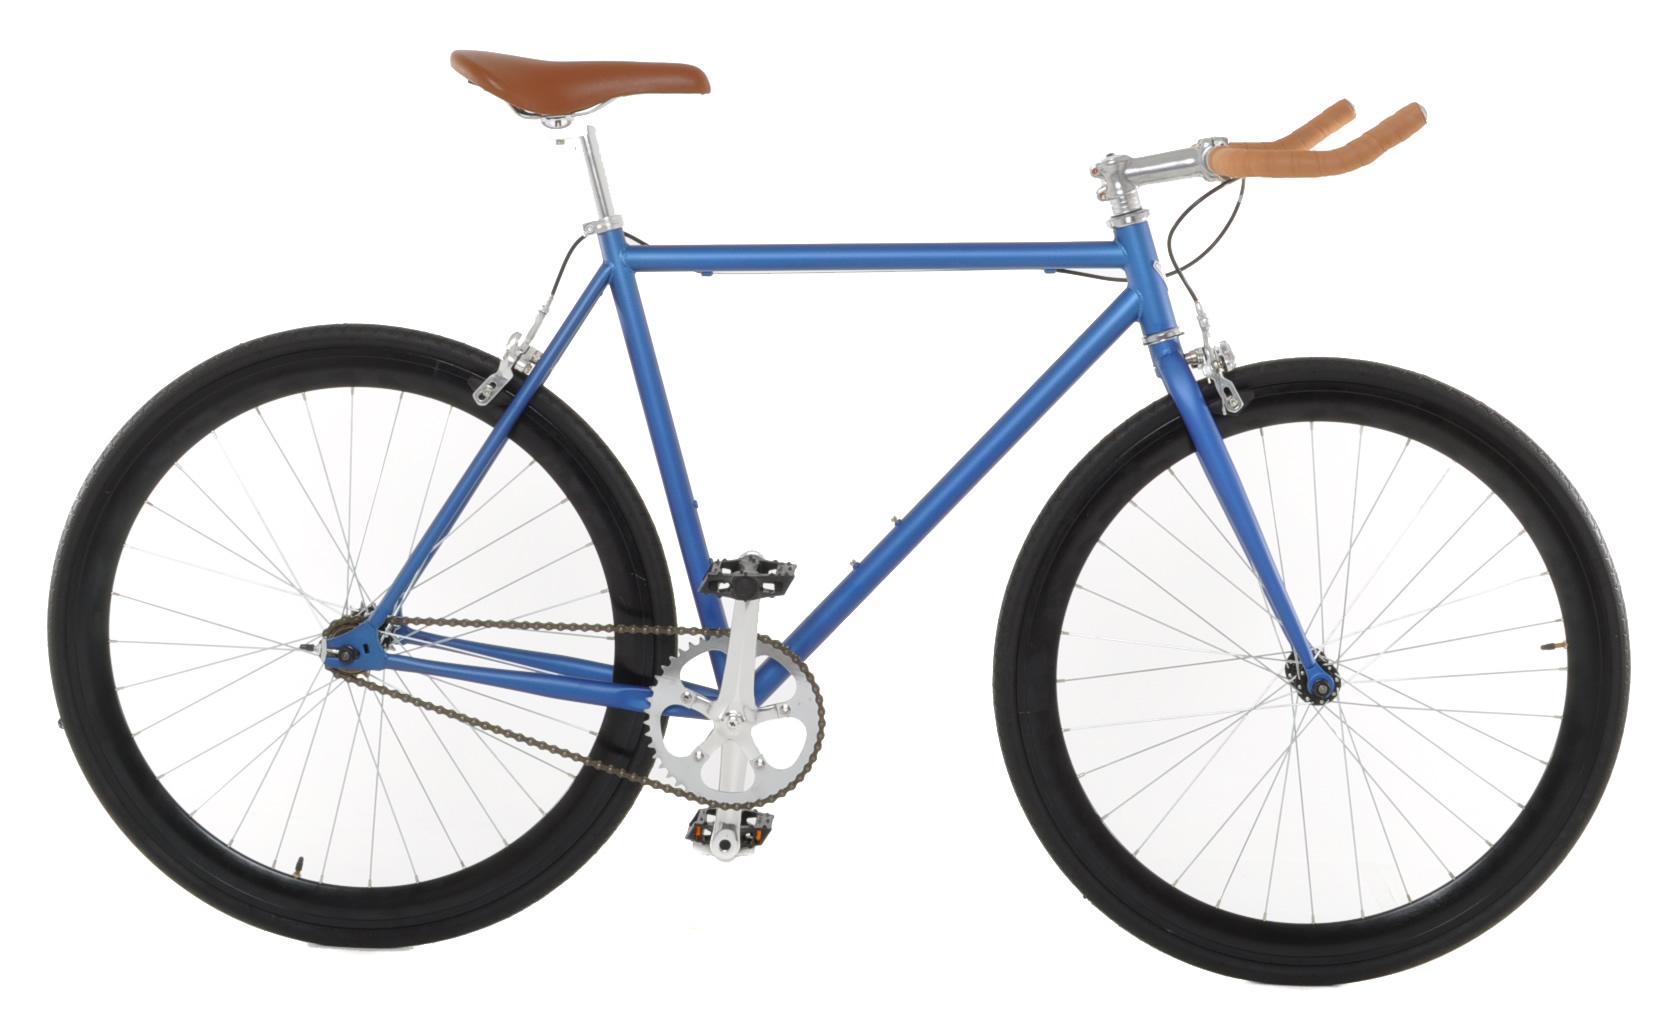 vilano edge fixed gear single speed bike ebay. Black Bedroom Furniture Sets. Home Design Ideas